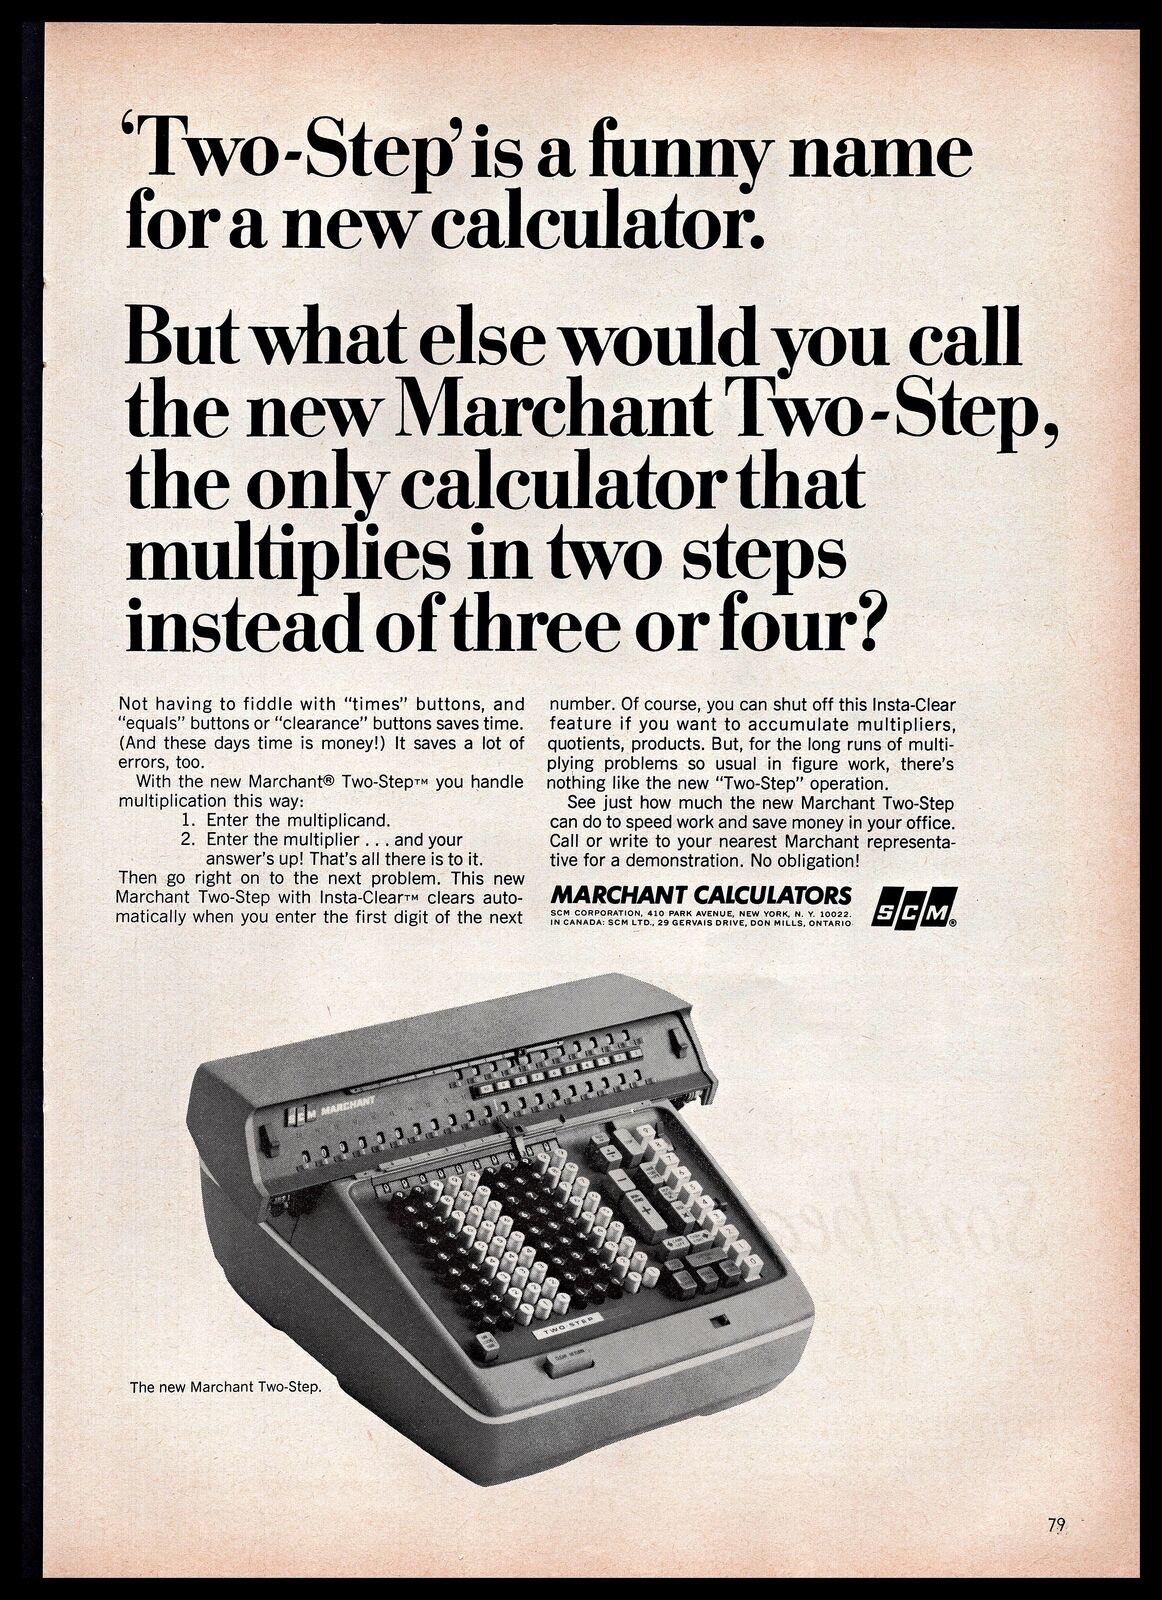 Details about 1965 SCM Corporation Marchant Two-Step Calculator B&W Vintage  PRINT AD 1960s